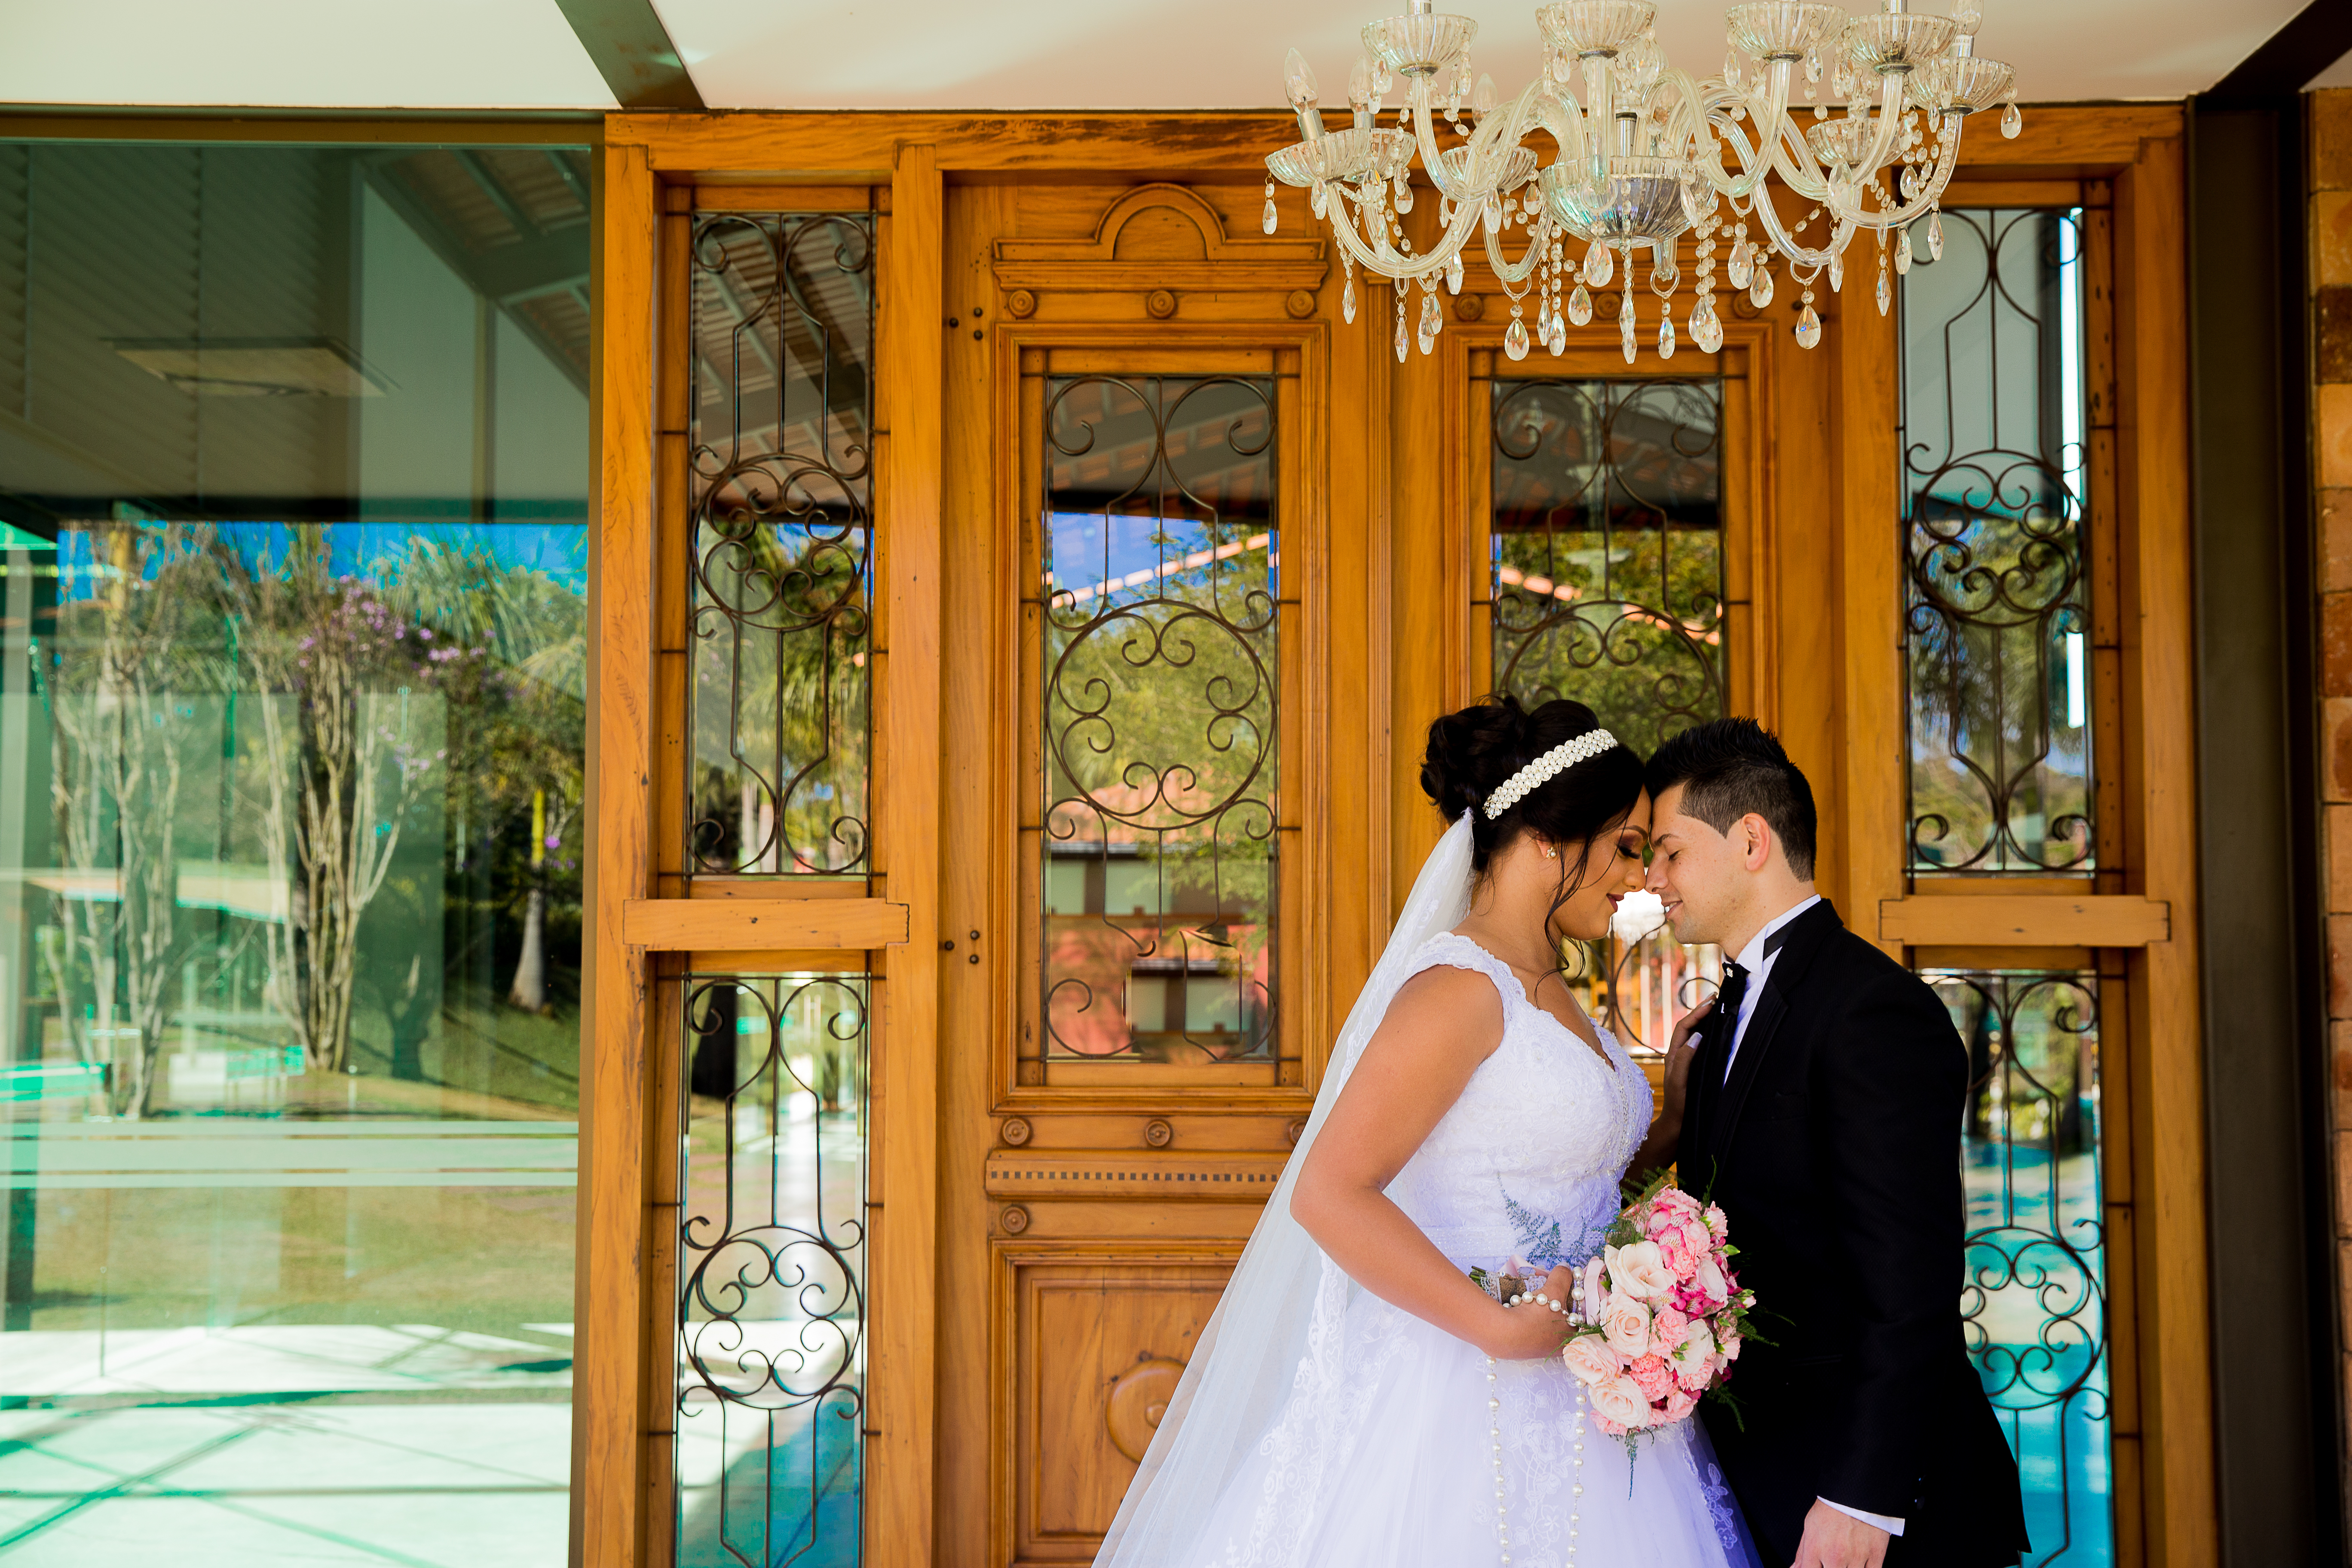 Contate Josi Contarelli Fotografia de casamento